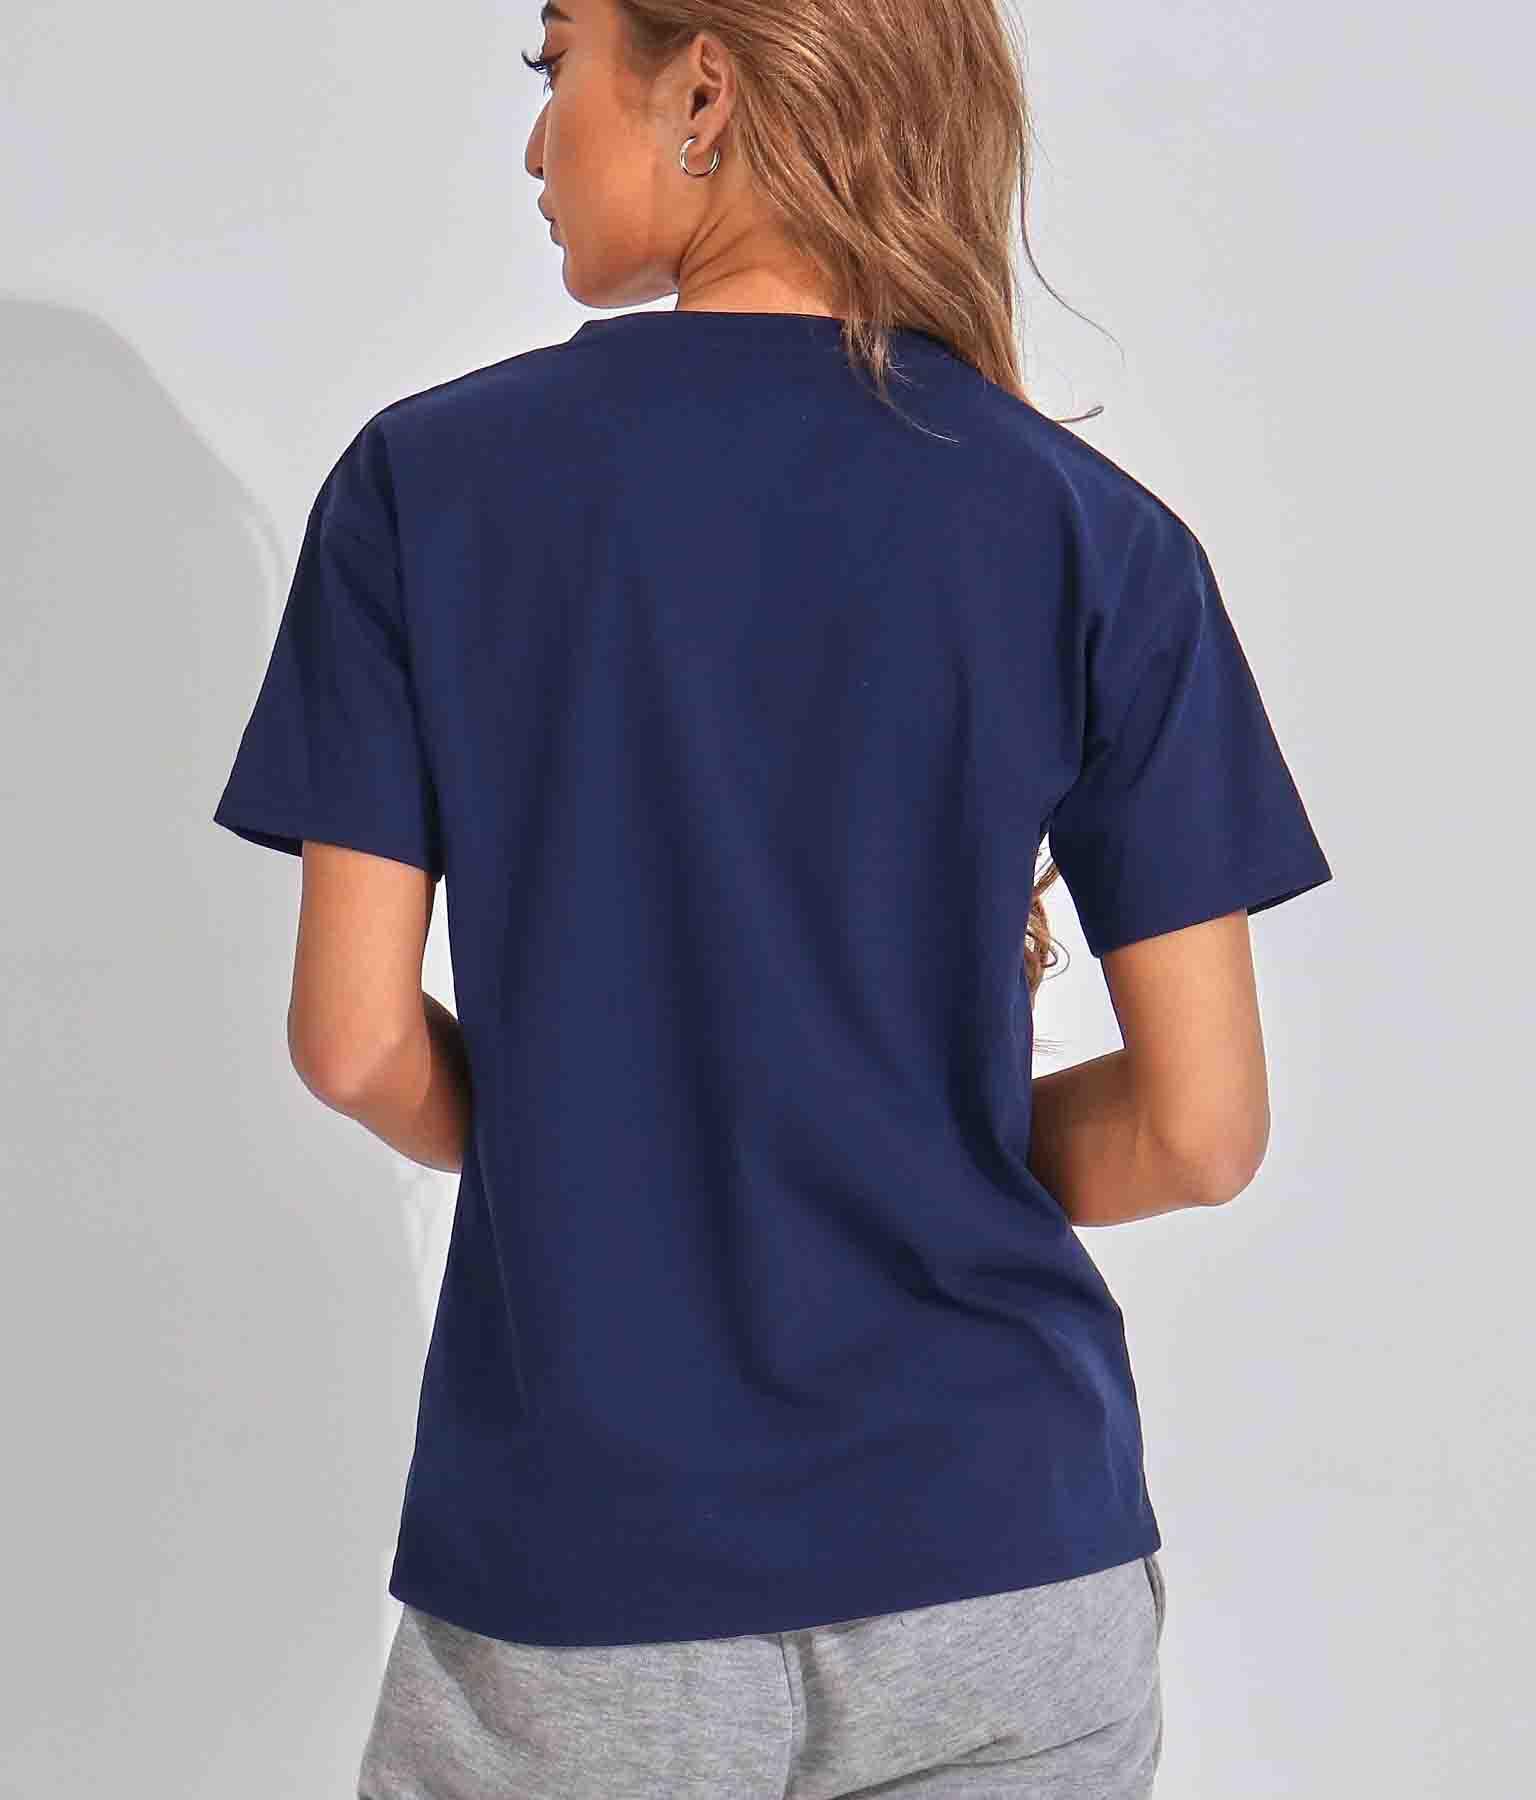 【FILA】ベーシック 半袖ロゴTシャツ(トップス/Tシャツ)   FILA2(委託)